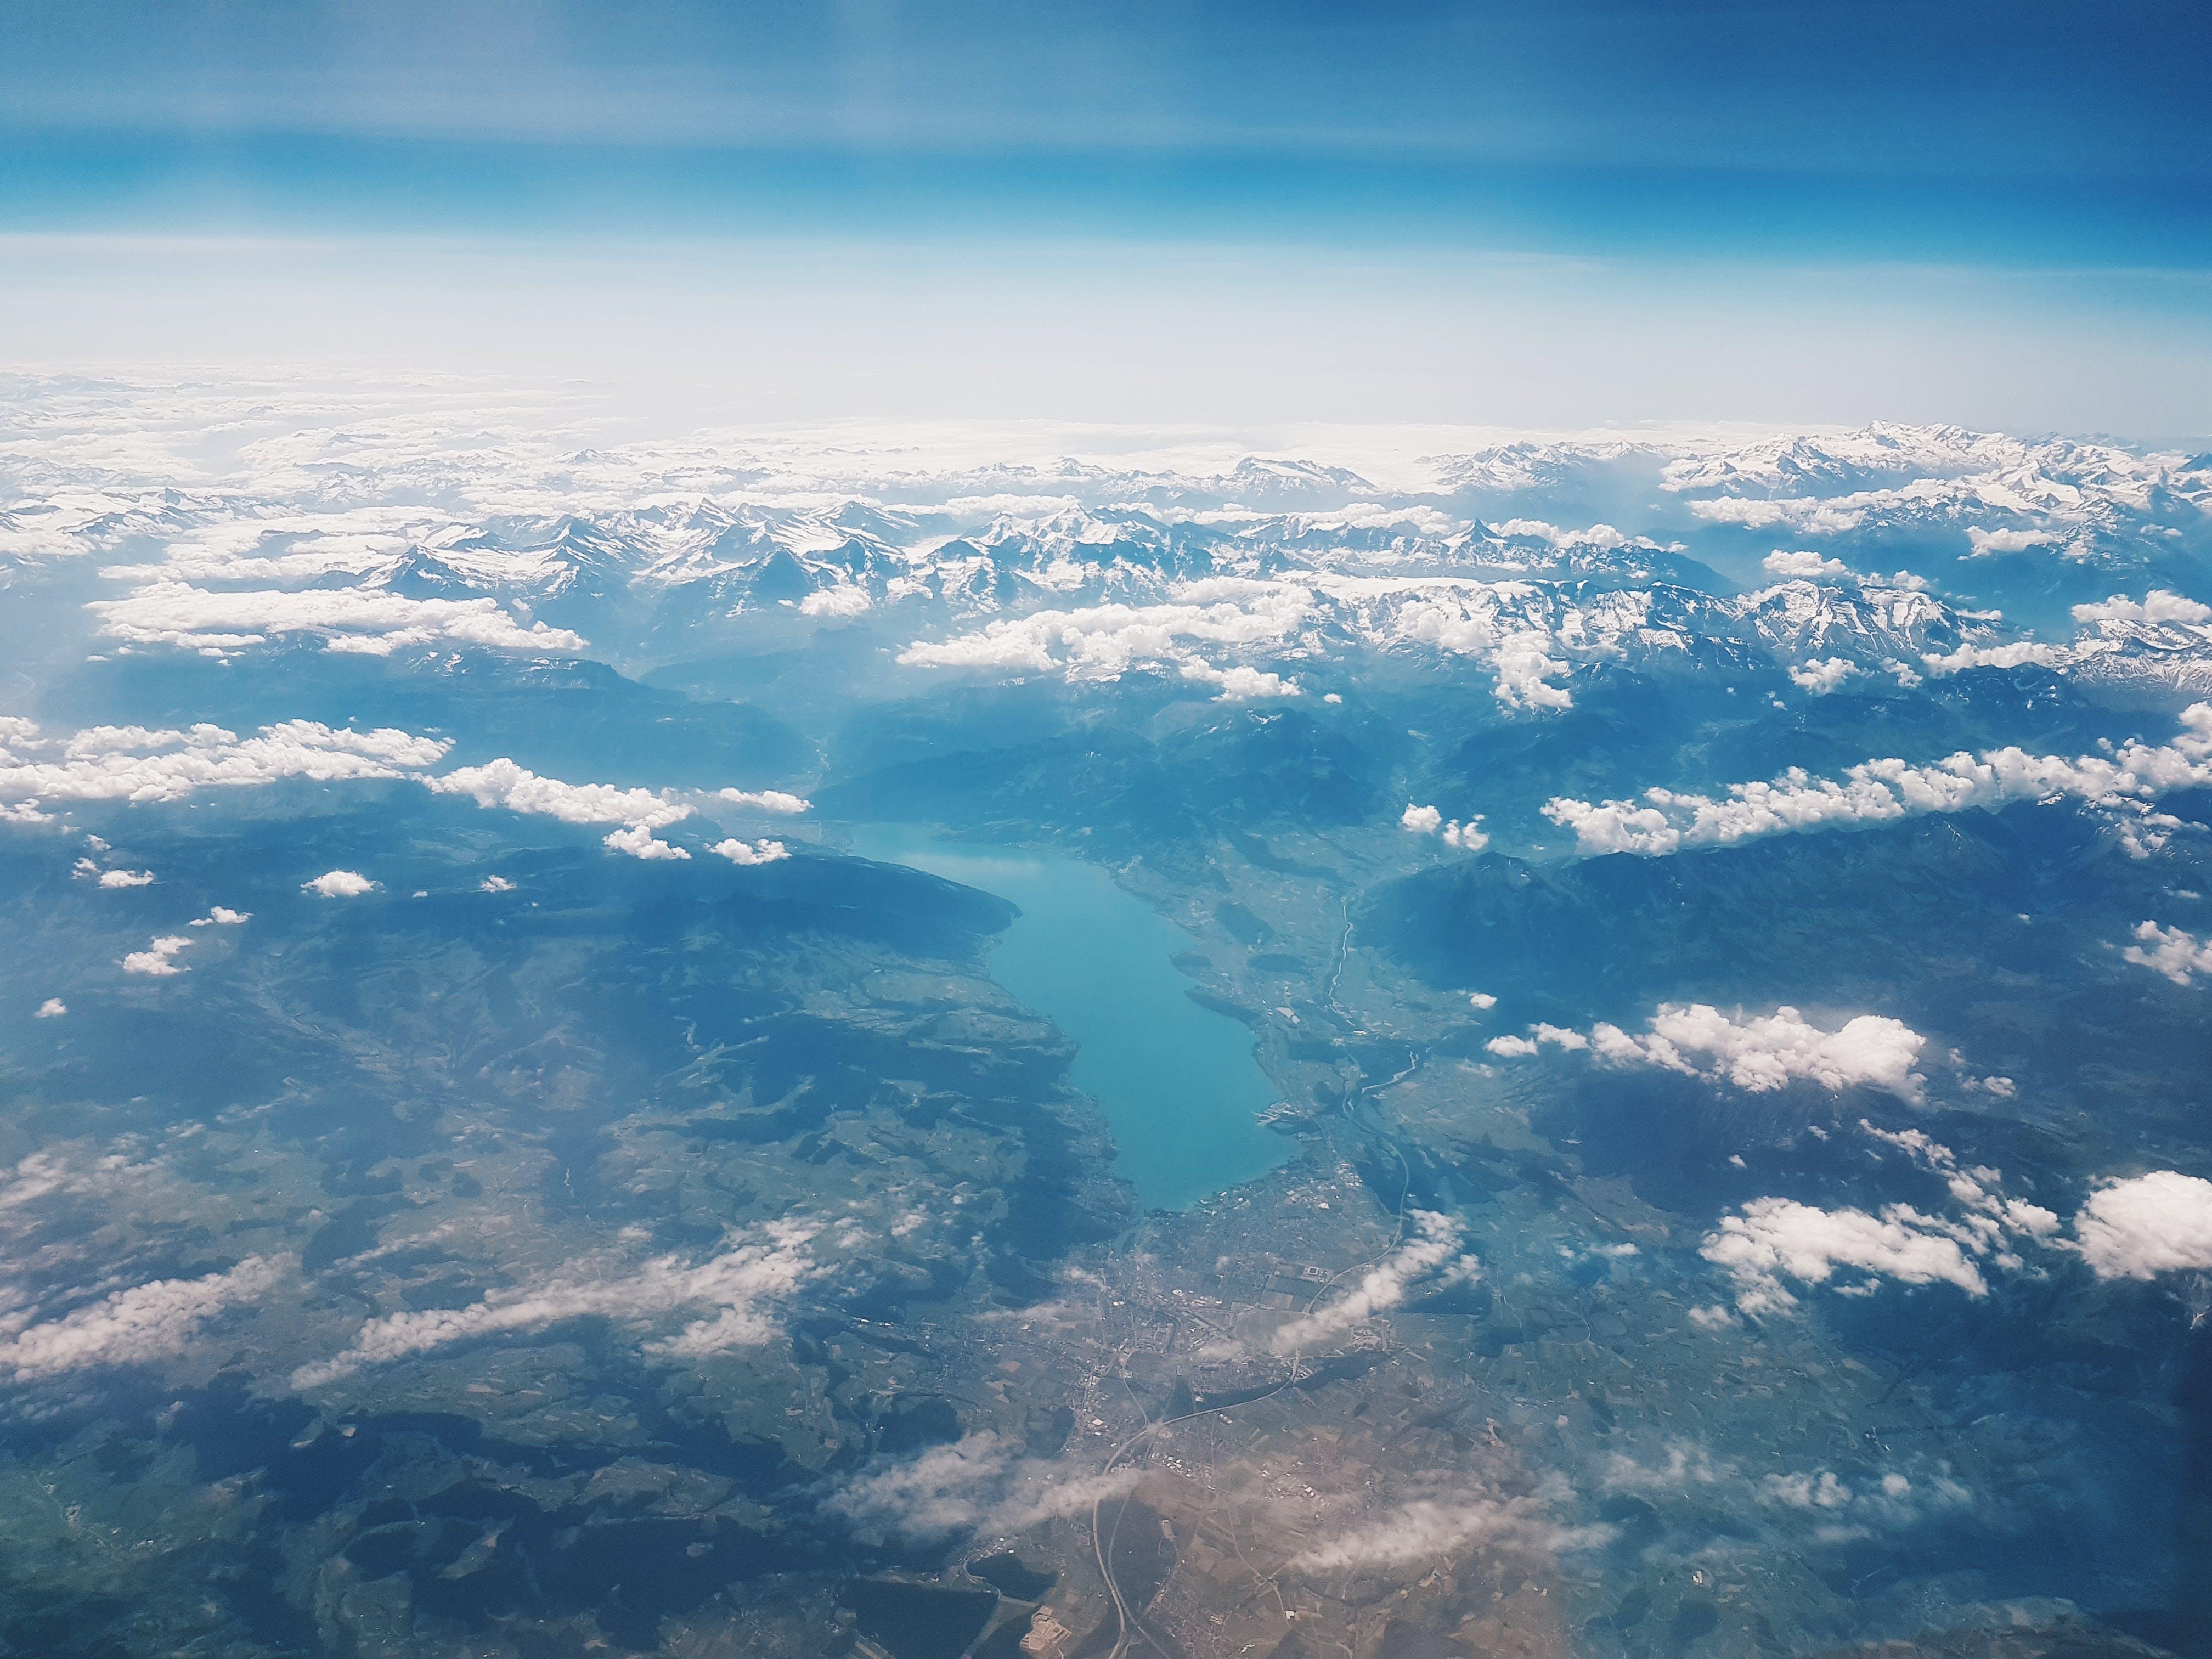 Aerial Photo of Land Mass